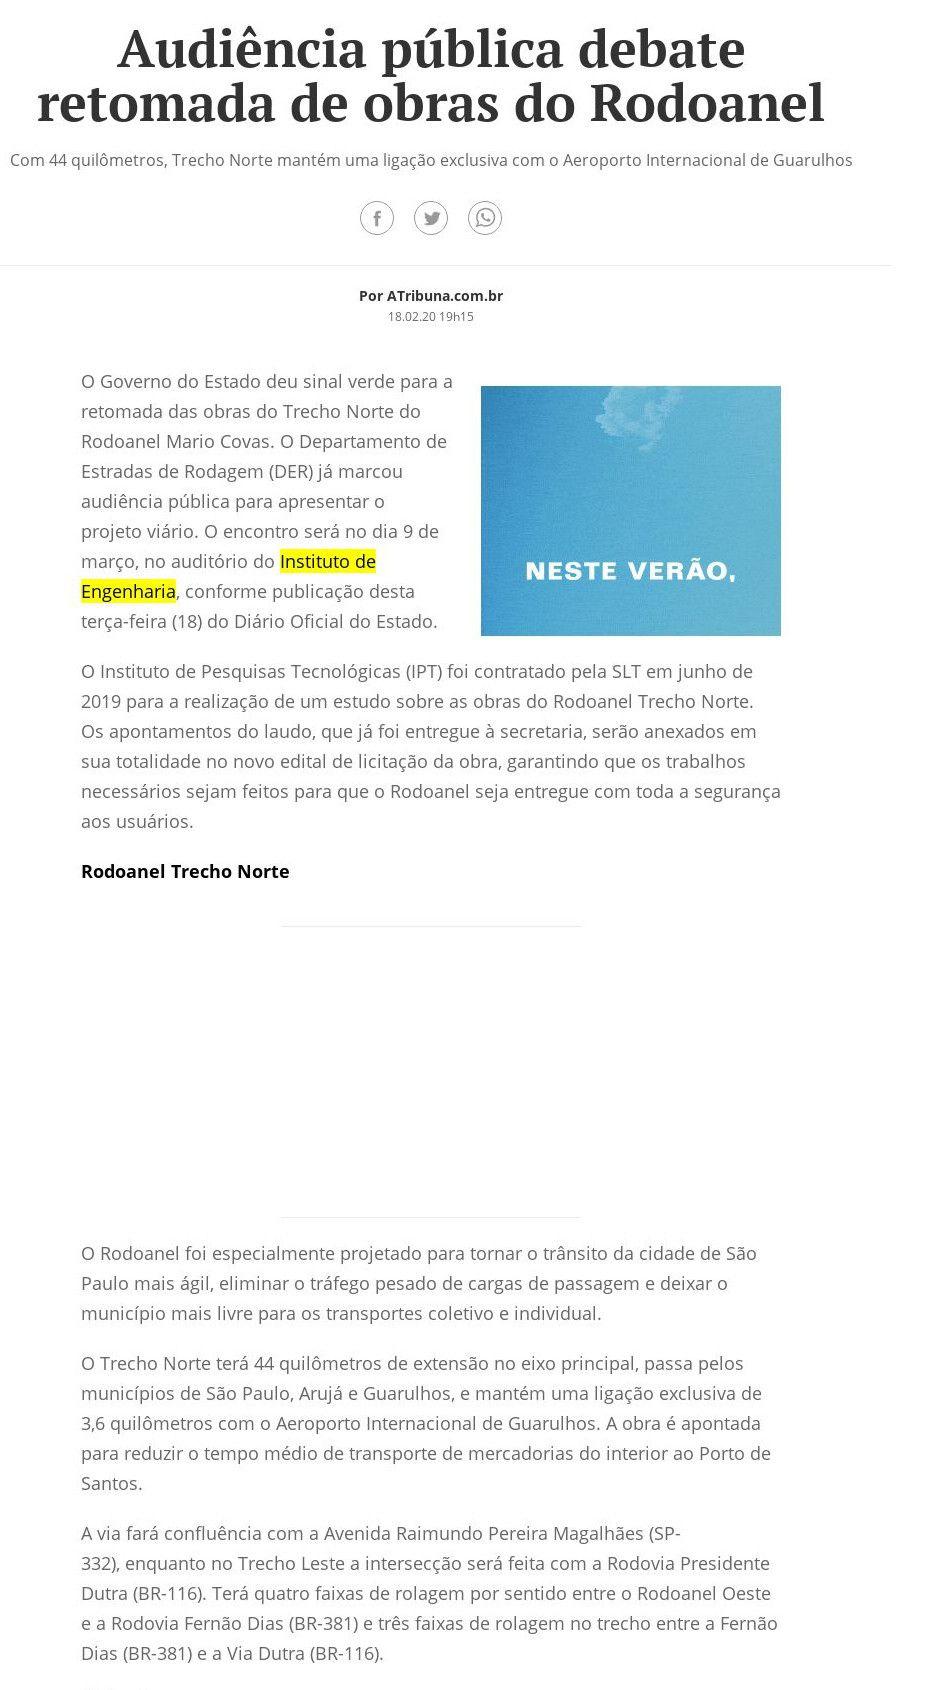 Audiência pública debate retomada de obras do Rodoanel - A Tribuna (On-line)